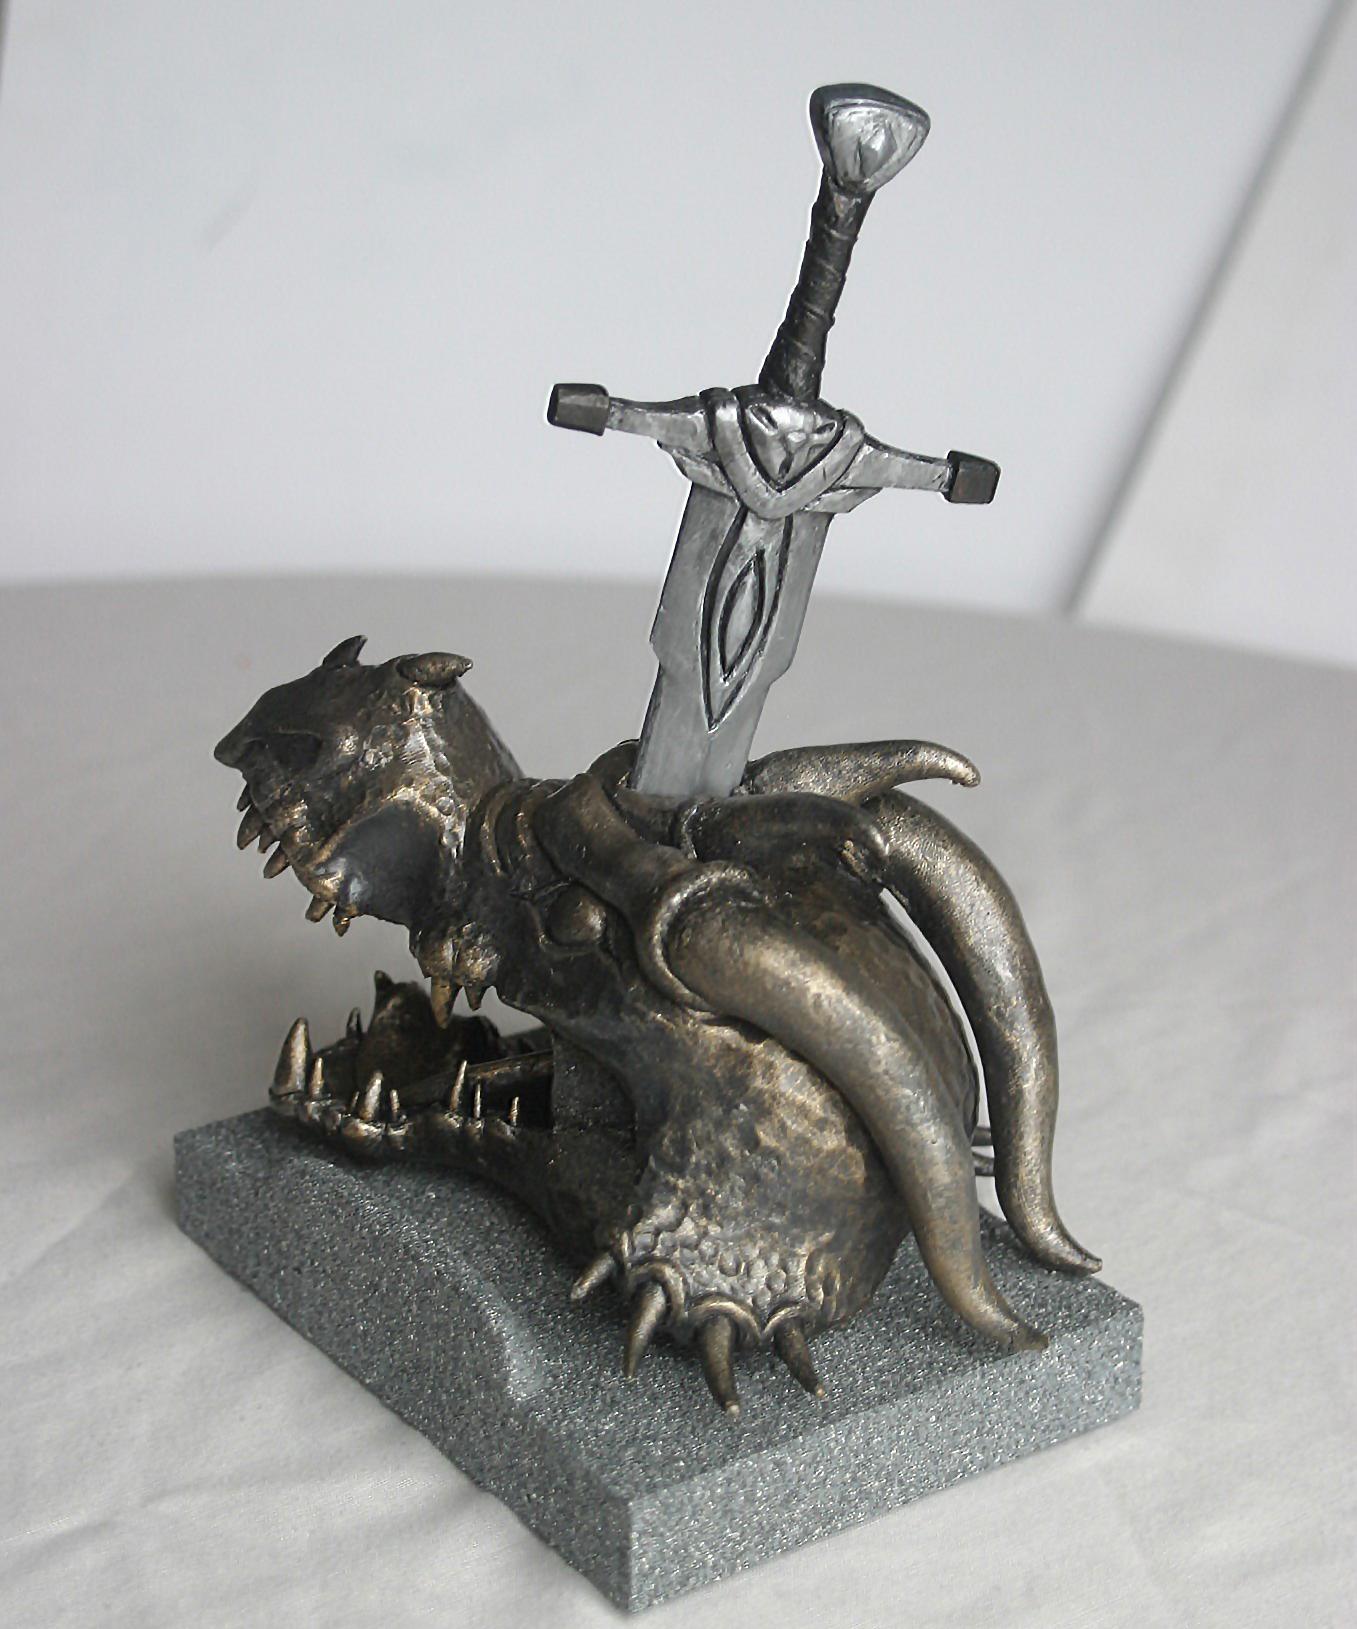 DragonCon Trophies